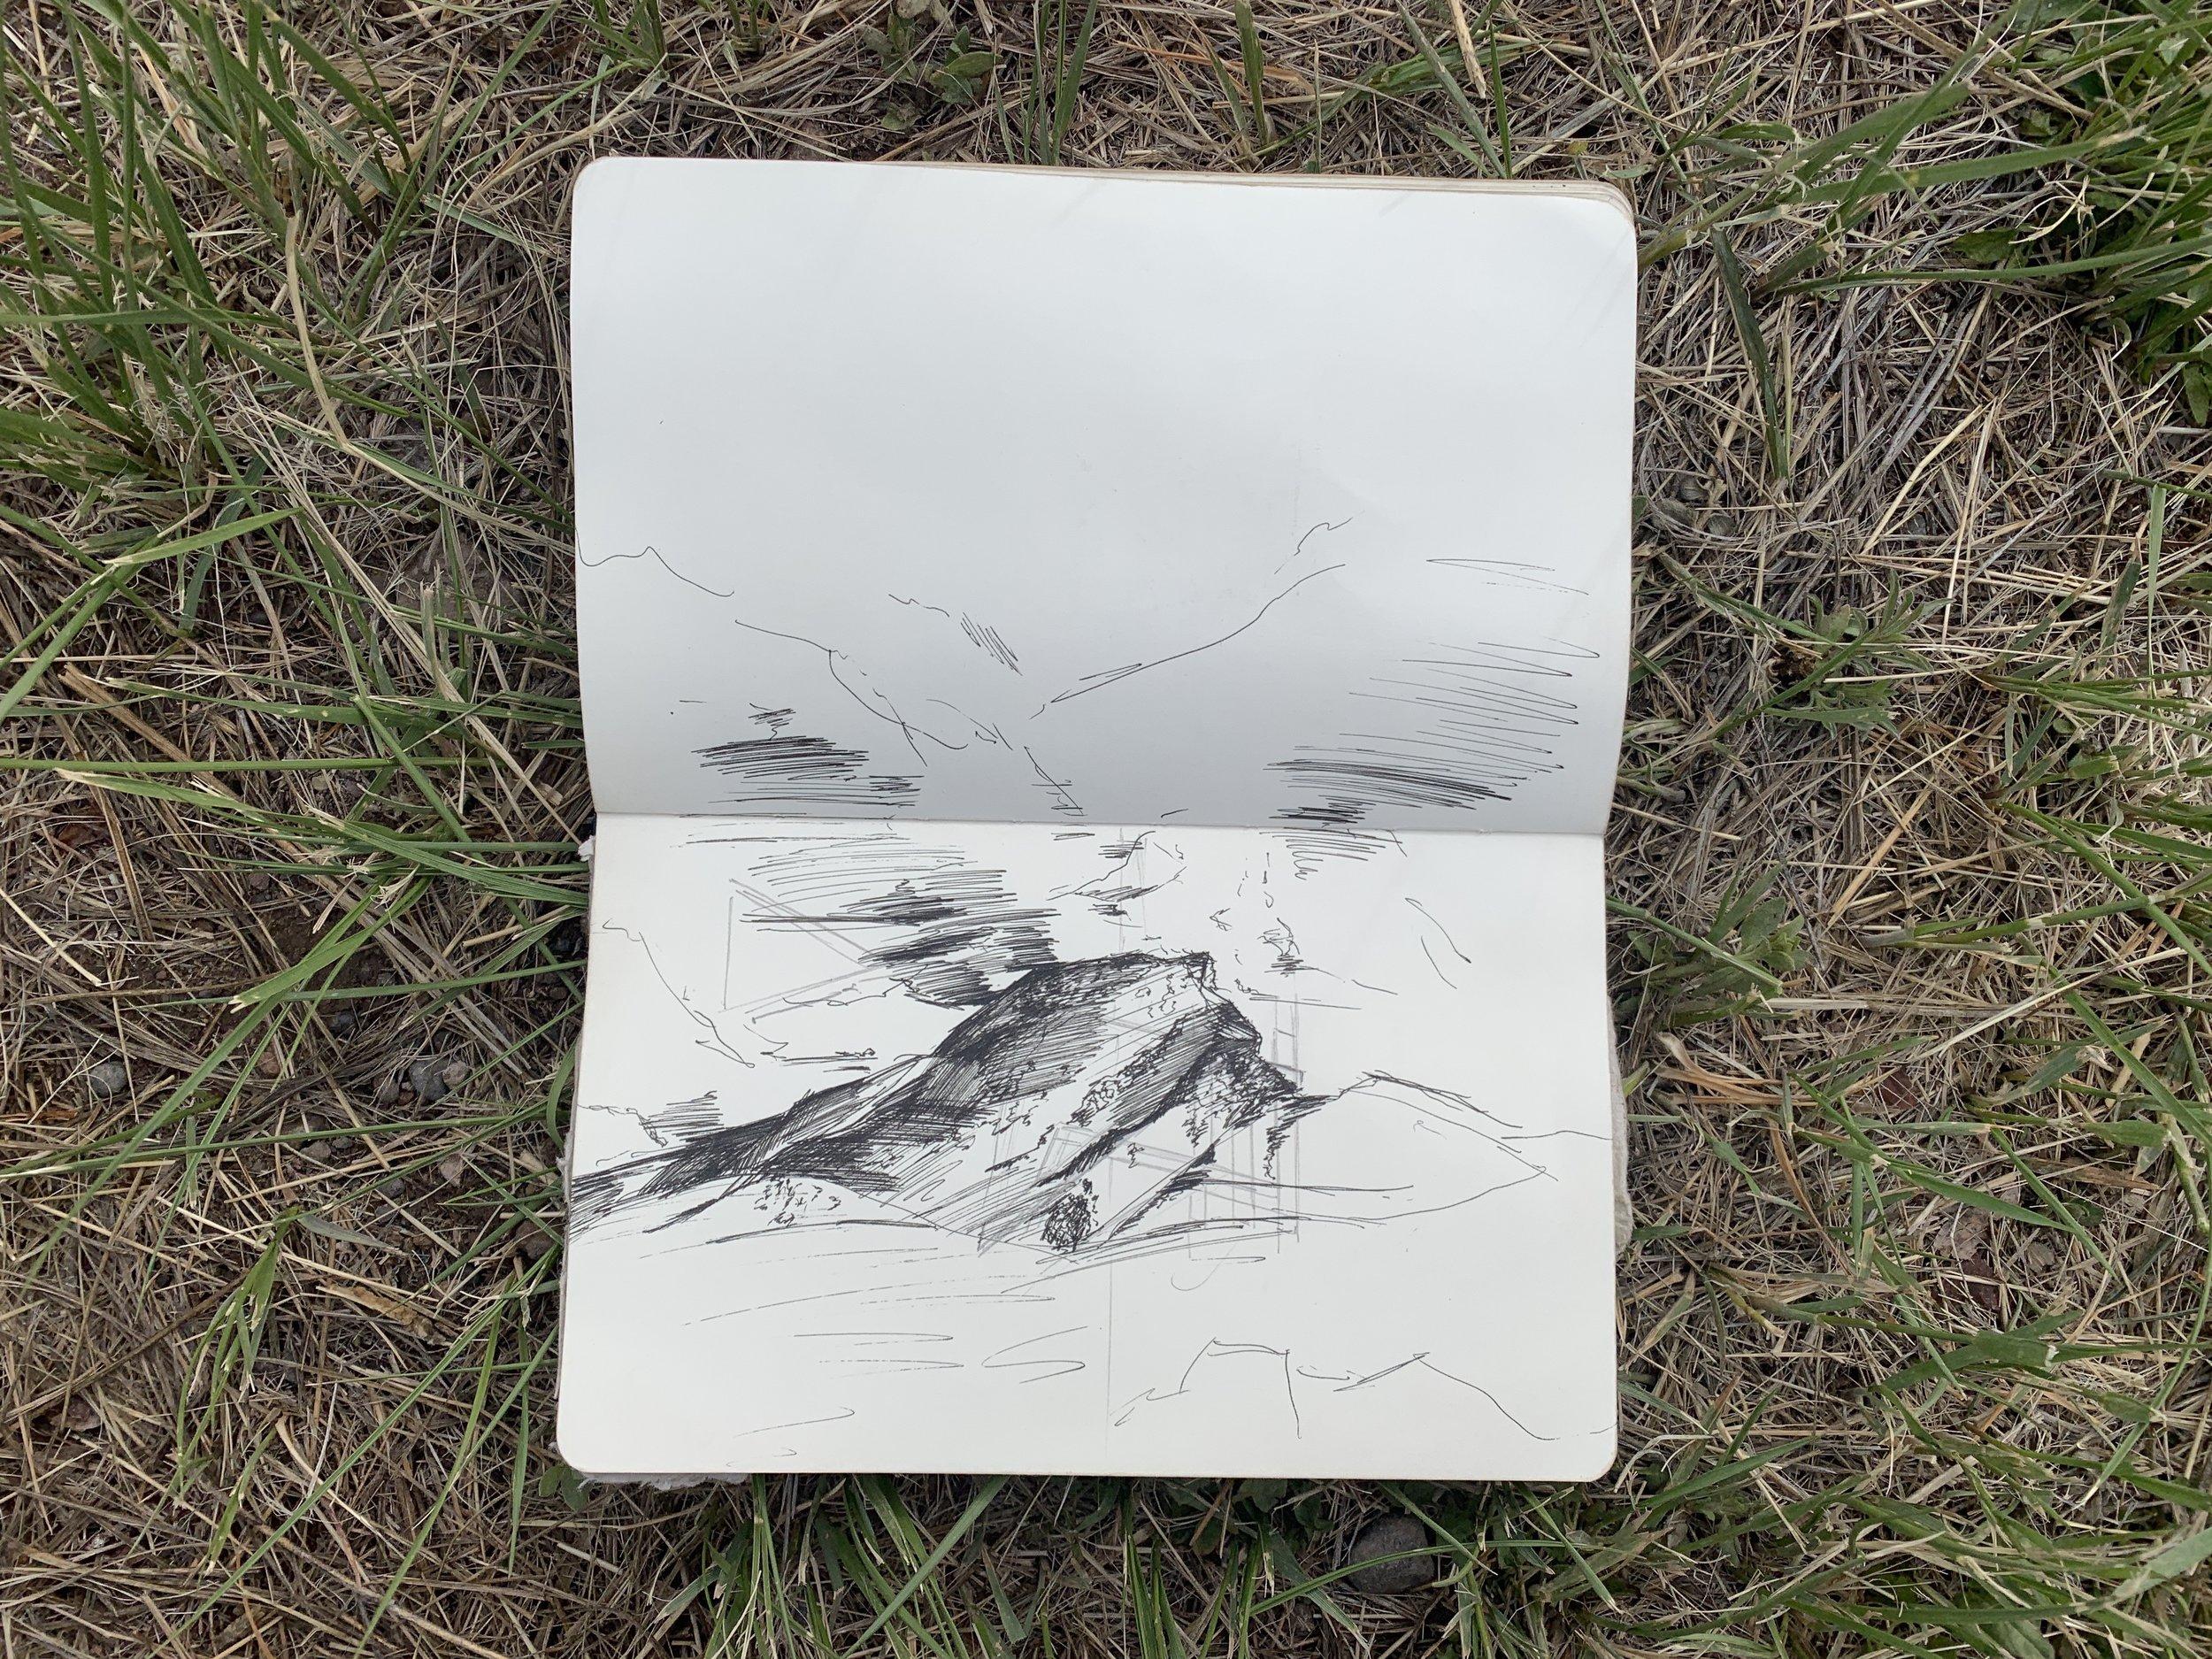 elephant rock, San Luis valley study